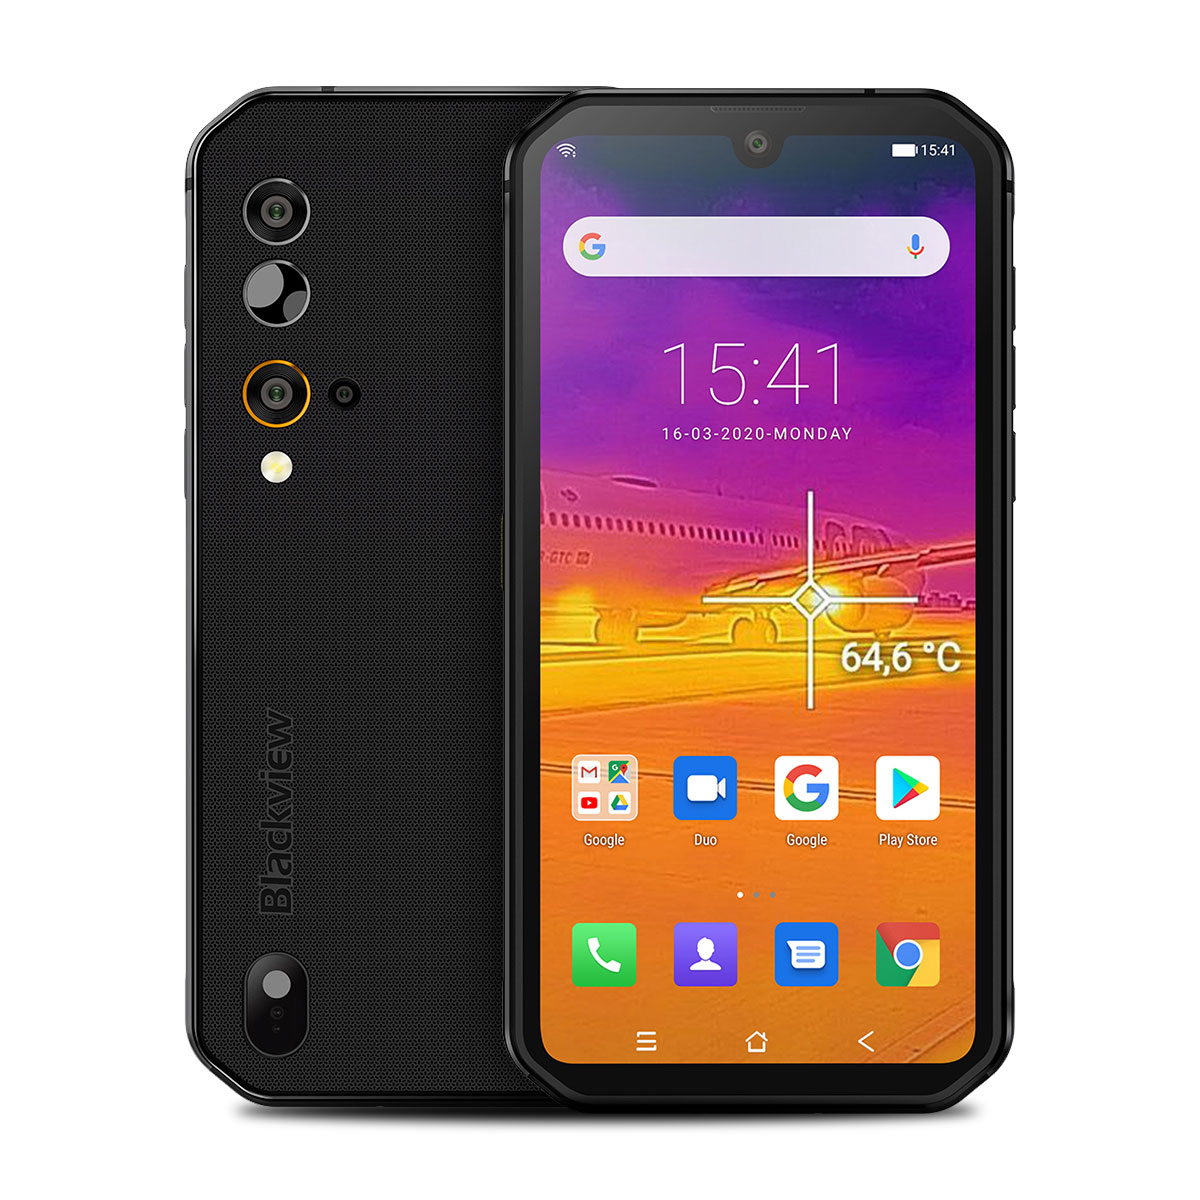 Blackview BV9900 Pro Thermal Camera Mobile Phone Helio P90 Octa Core 8GB+128GB IP68 Rugged Smartphone 48MP Quad Rear Camera black_European regulations